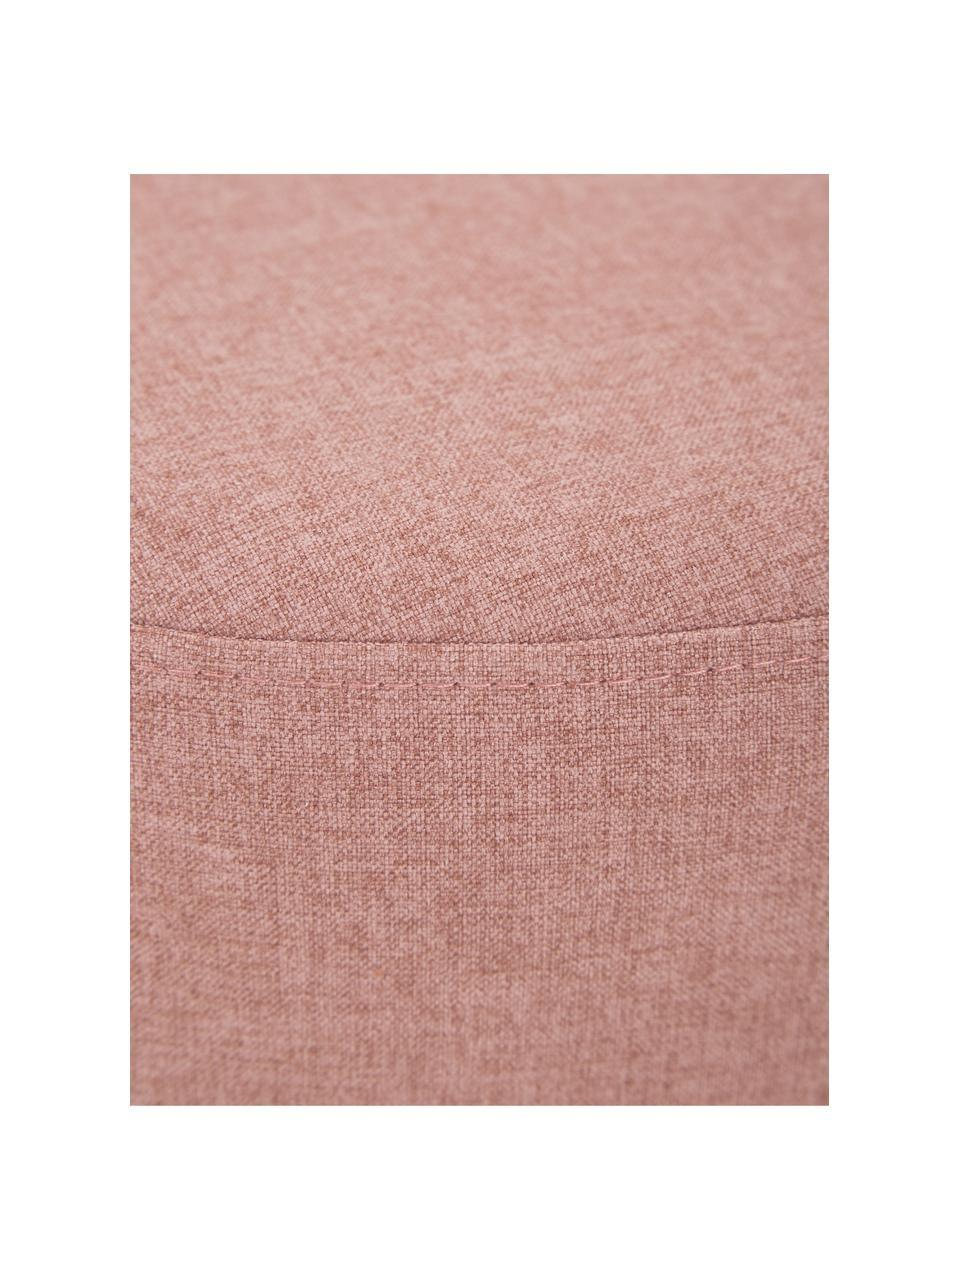 Hocker Mara in Rosa mit Wiener Geflecht, Bezug: Polyester Der hochwertige, Rahmen: Sperrholz, Fuß: Massives Birkenholz, Ratt, Webstoff Altrosa, Ø 37 x H 39 cm